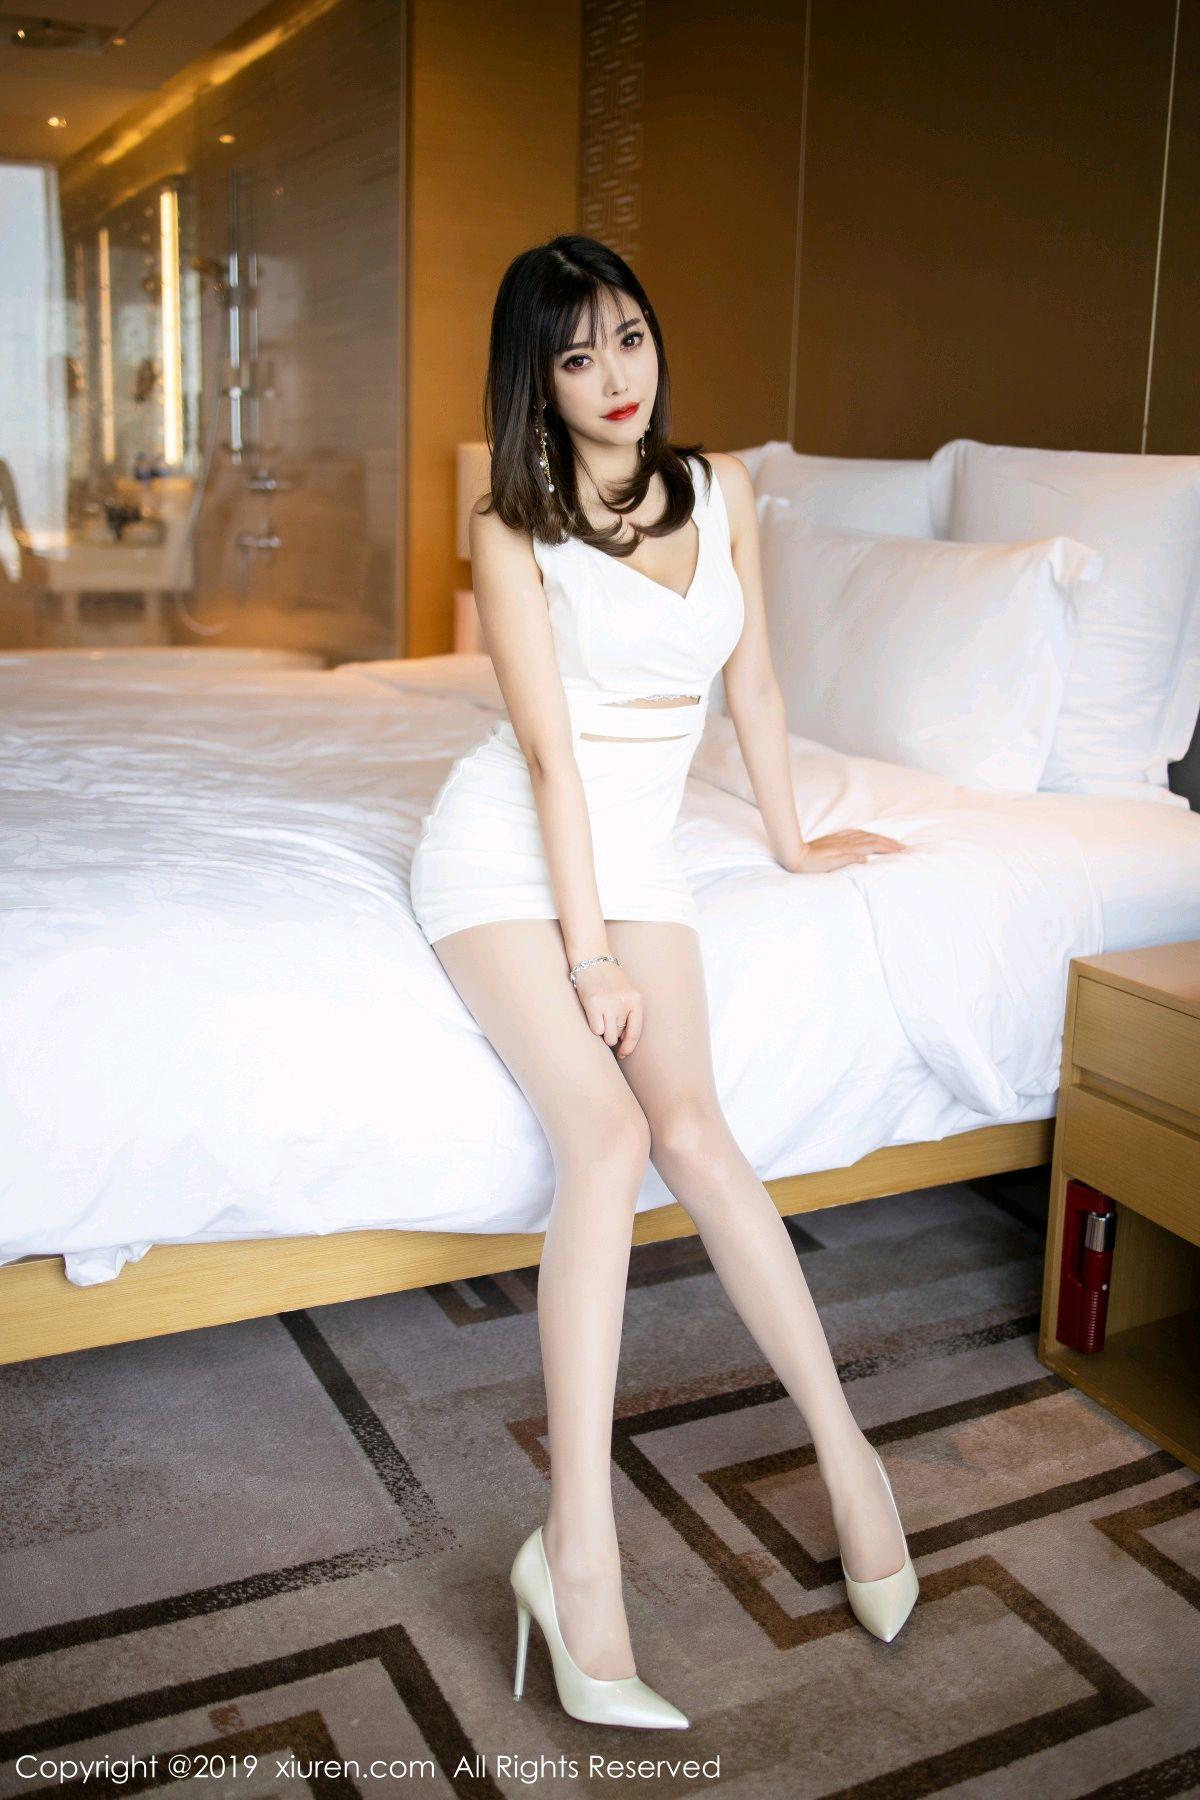 [XiuRen] Vol.1695 Yang Chen Chen 31P, Foot, Tall, Underwear, Xiuren, Yang Chen Chen